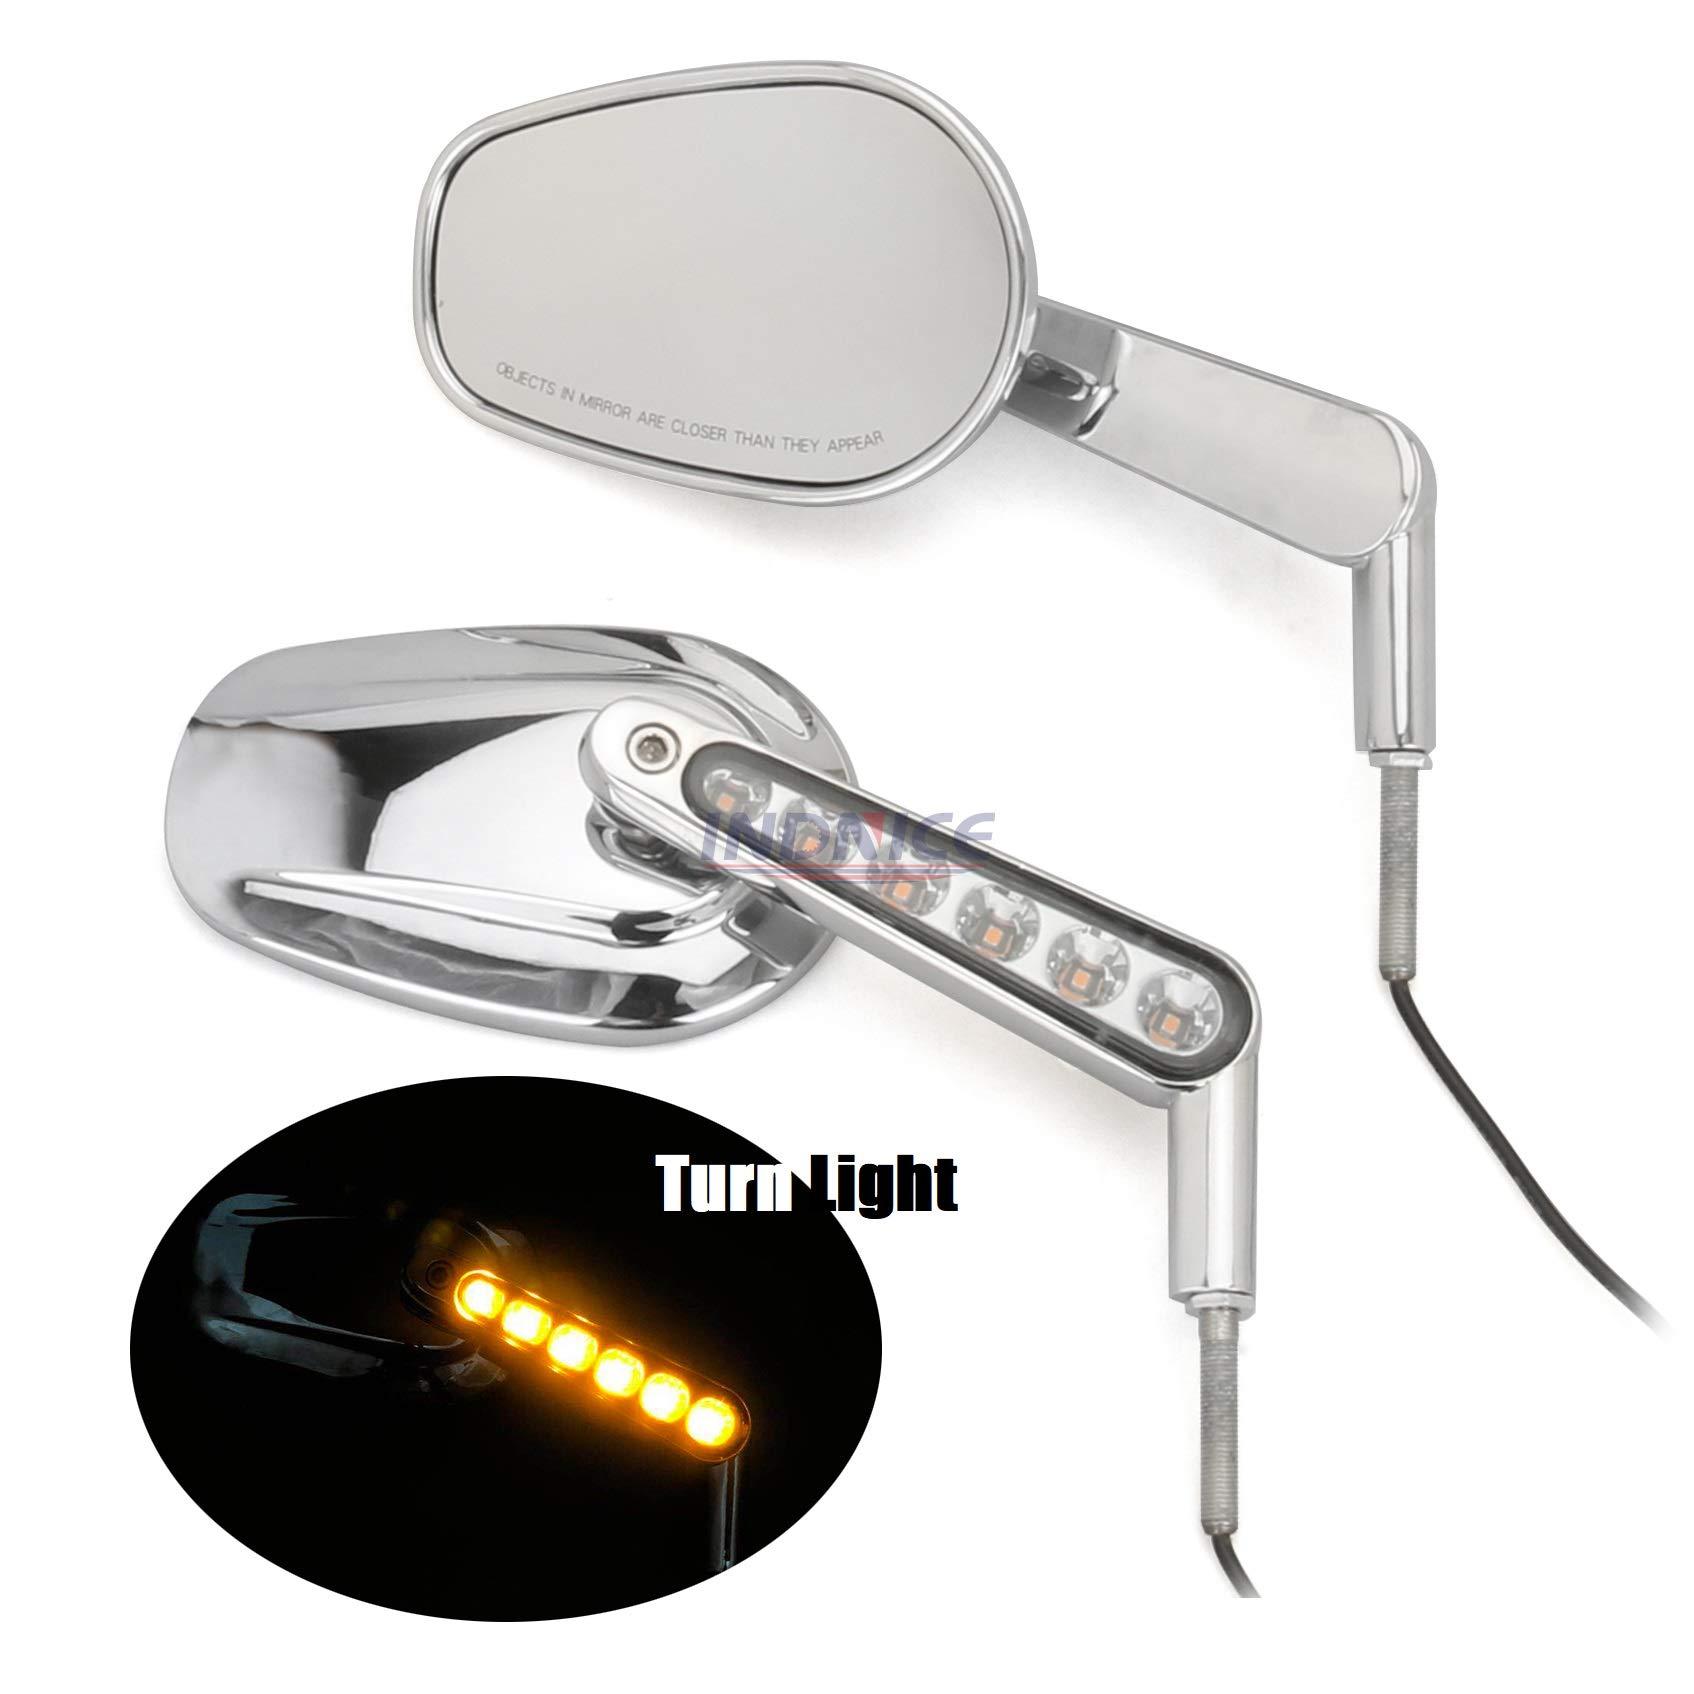 Rear View Mirrors Muscle LED Turn Signals Light For Harley V-ROD V ROD VRSCF